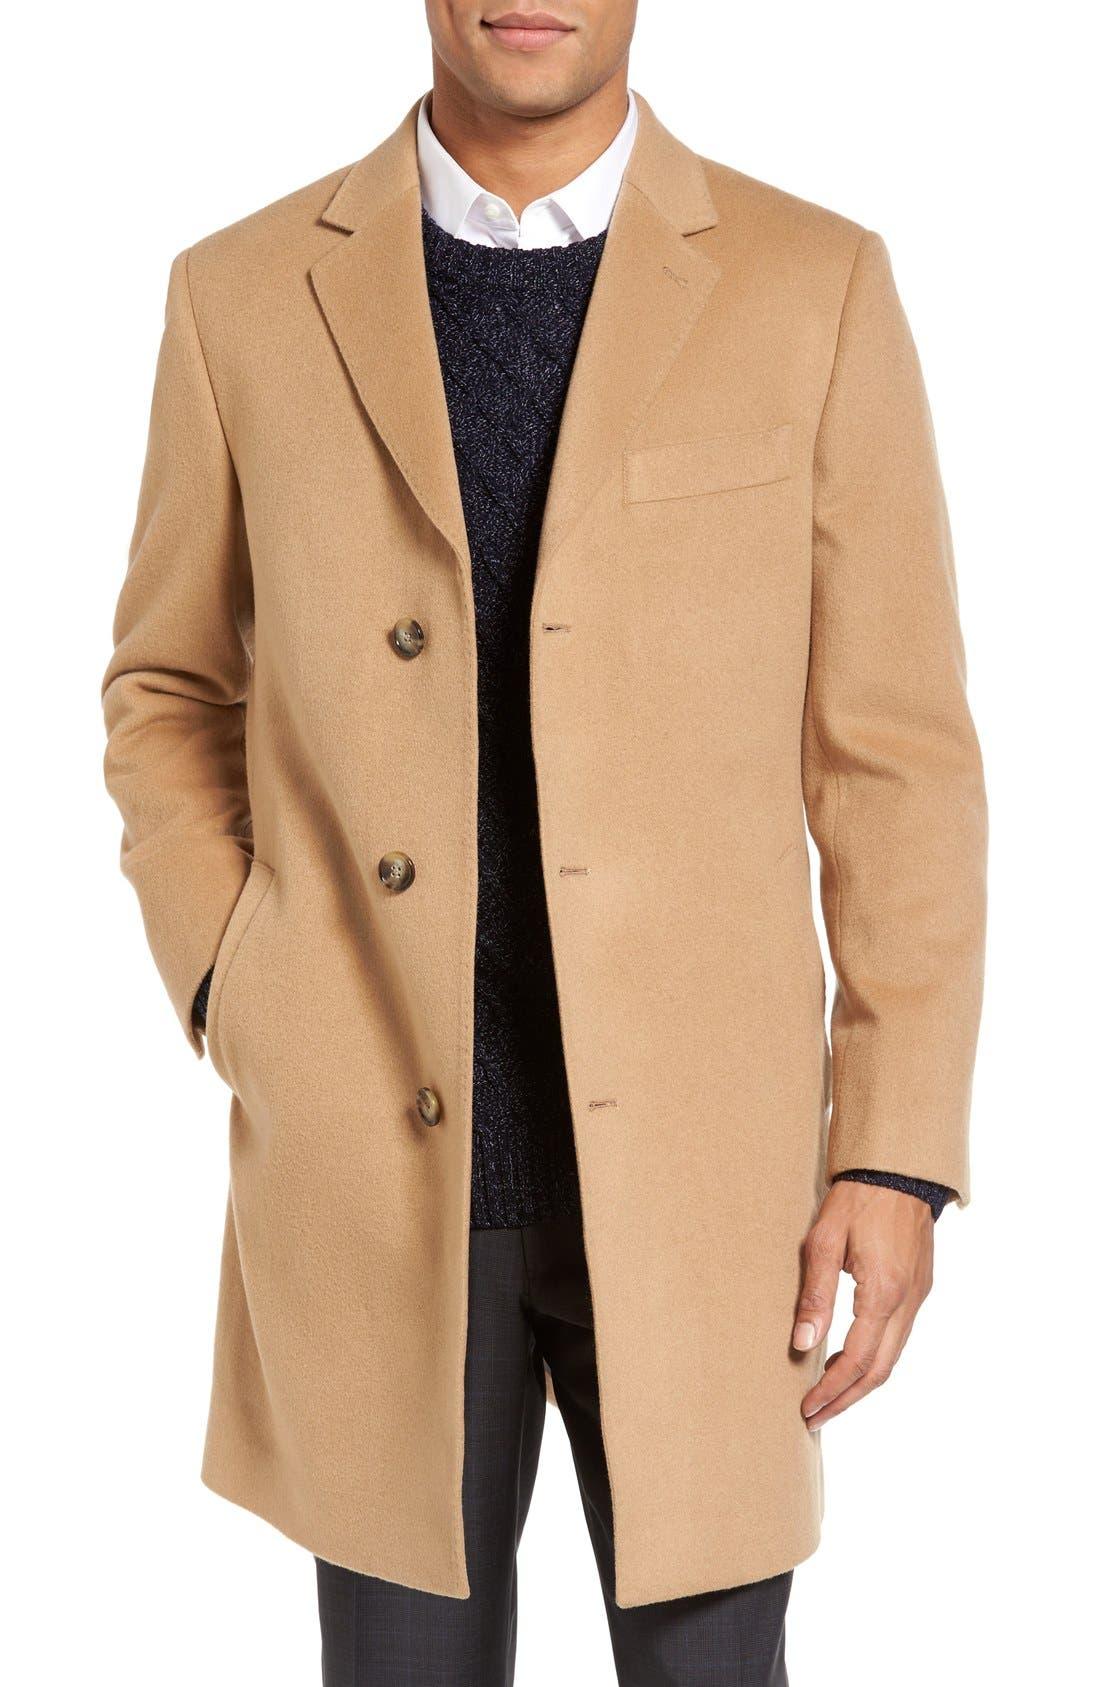 Main Image - Nordstrom Men's Shop Freemont Wool & Cashmere Overcoat